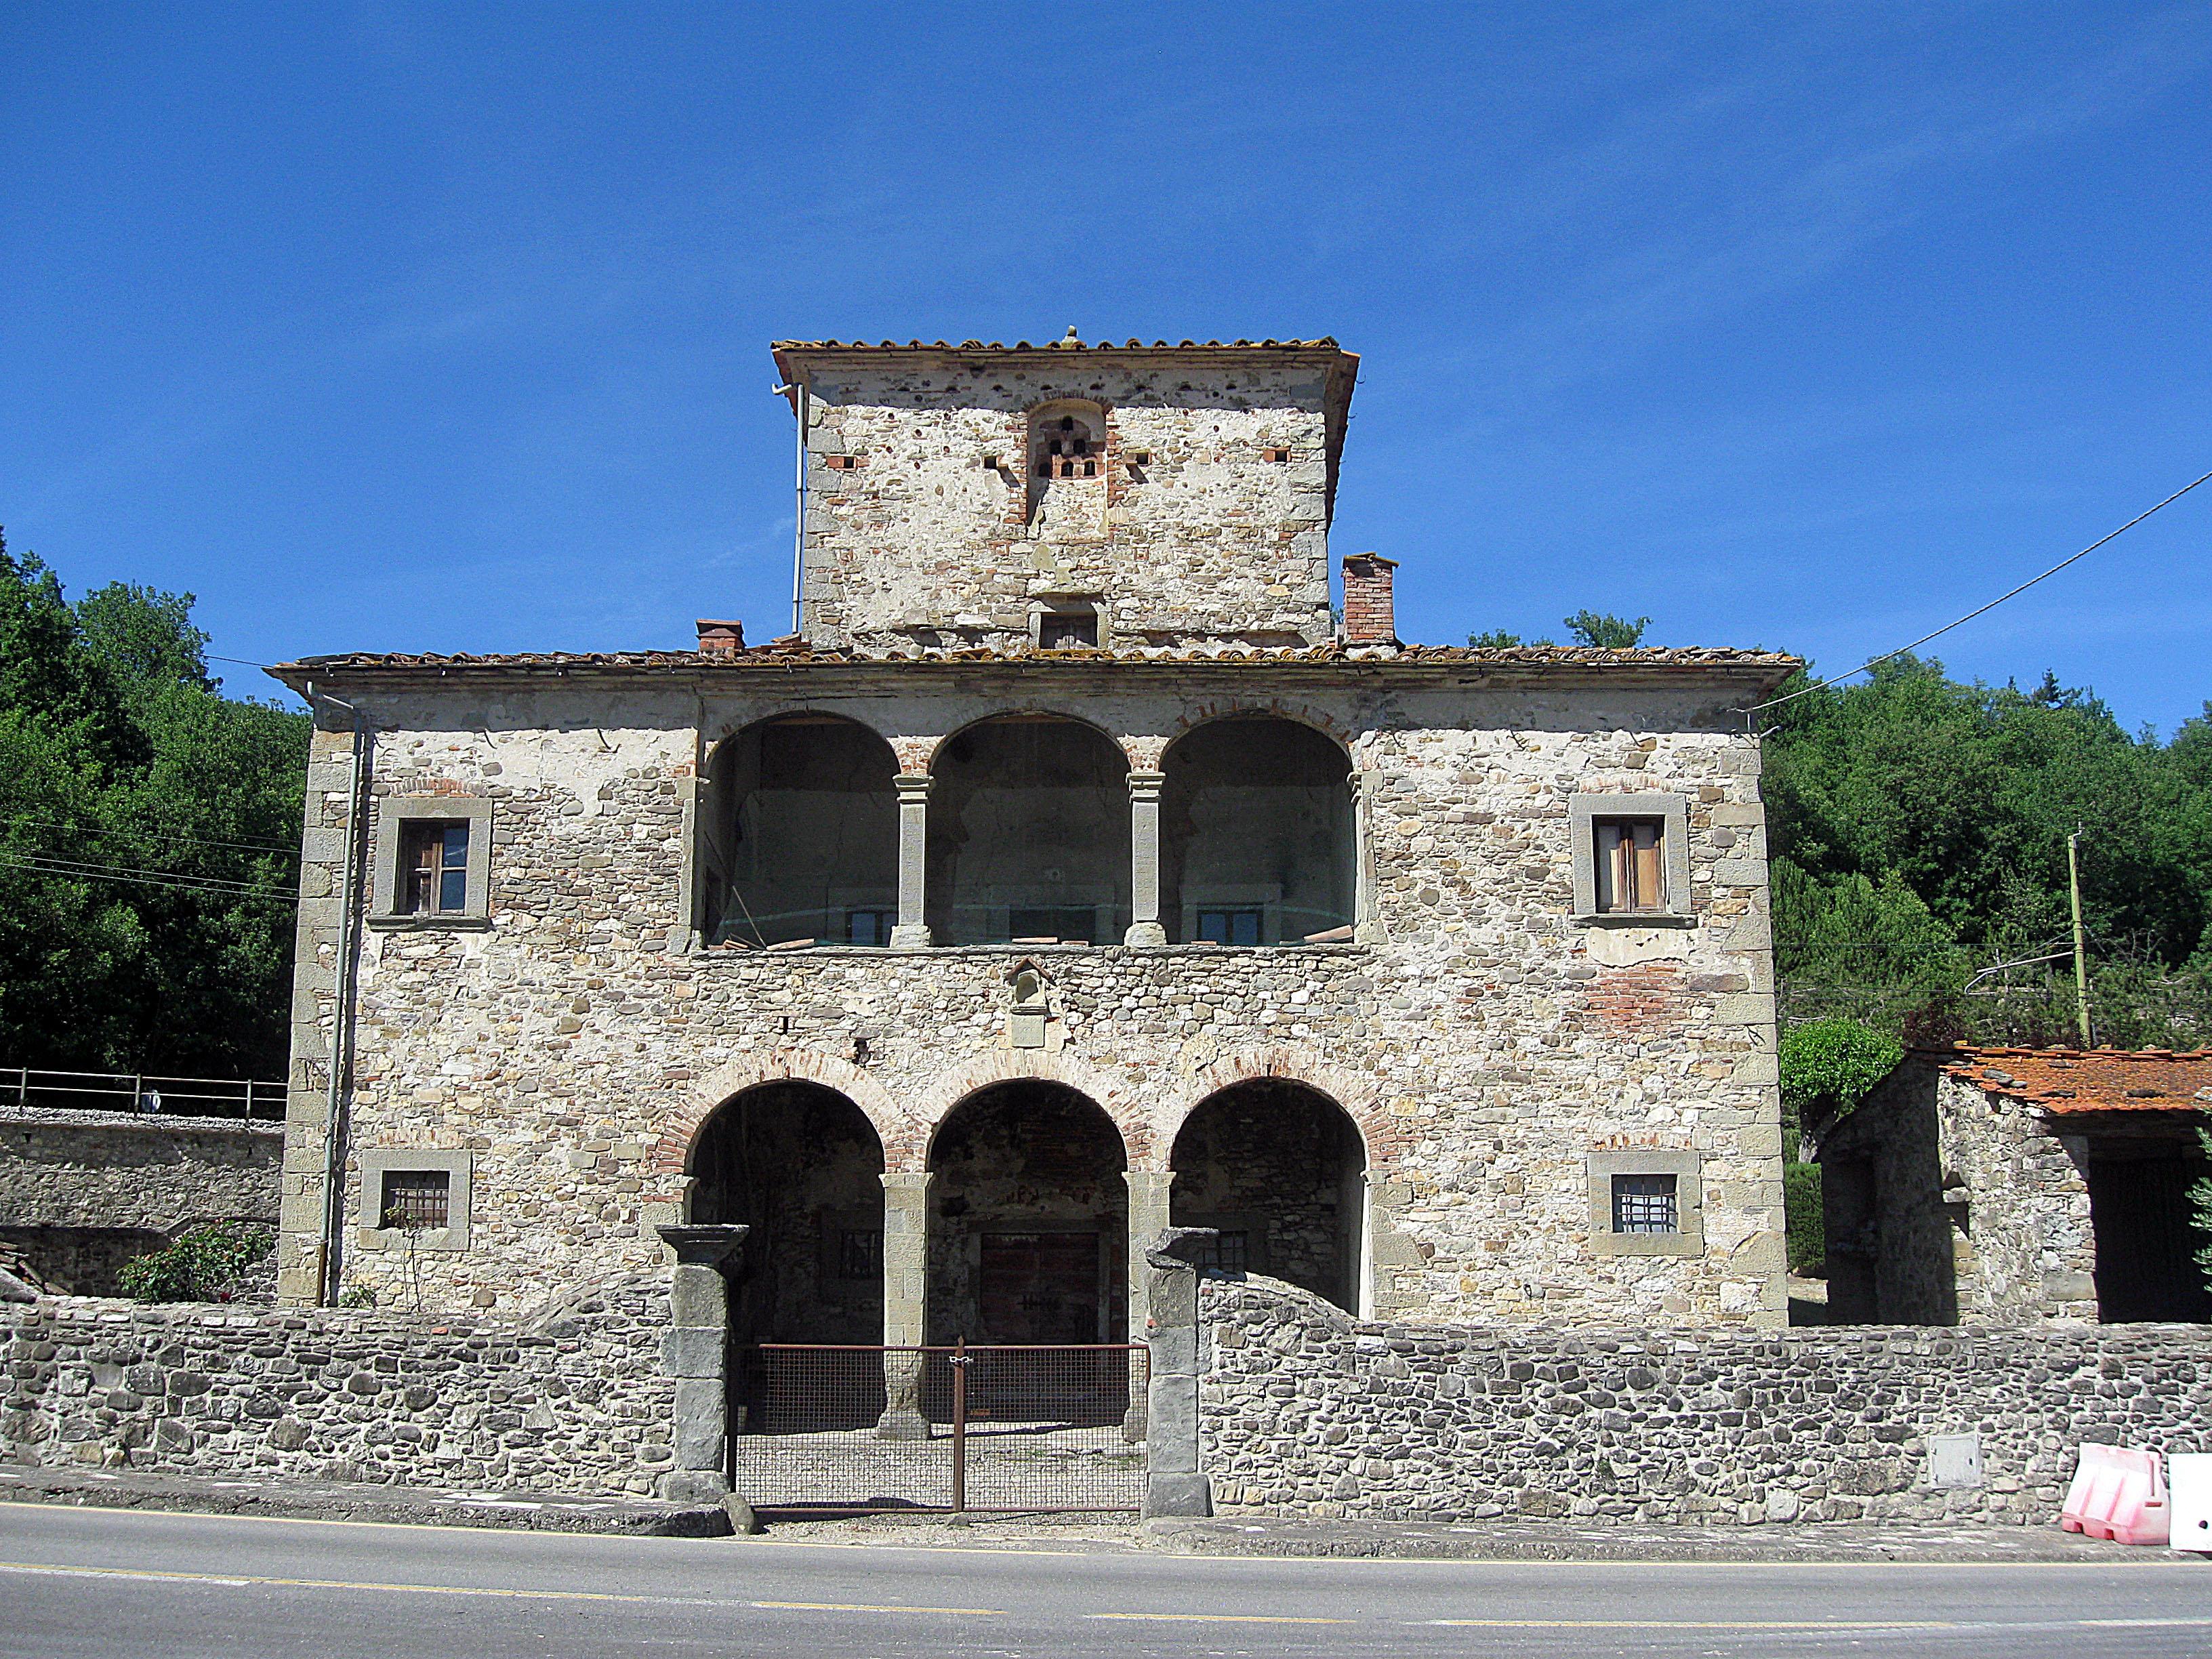 Casa colonica in toscana tuttatoscana - Piano casa toscana ...